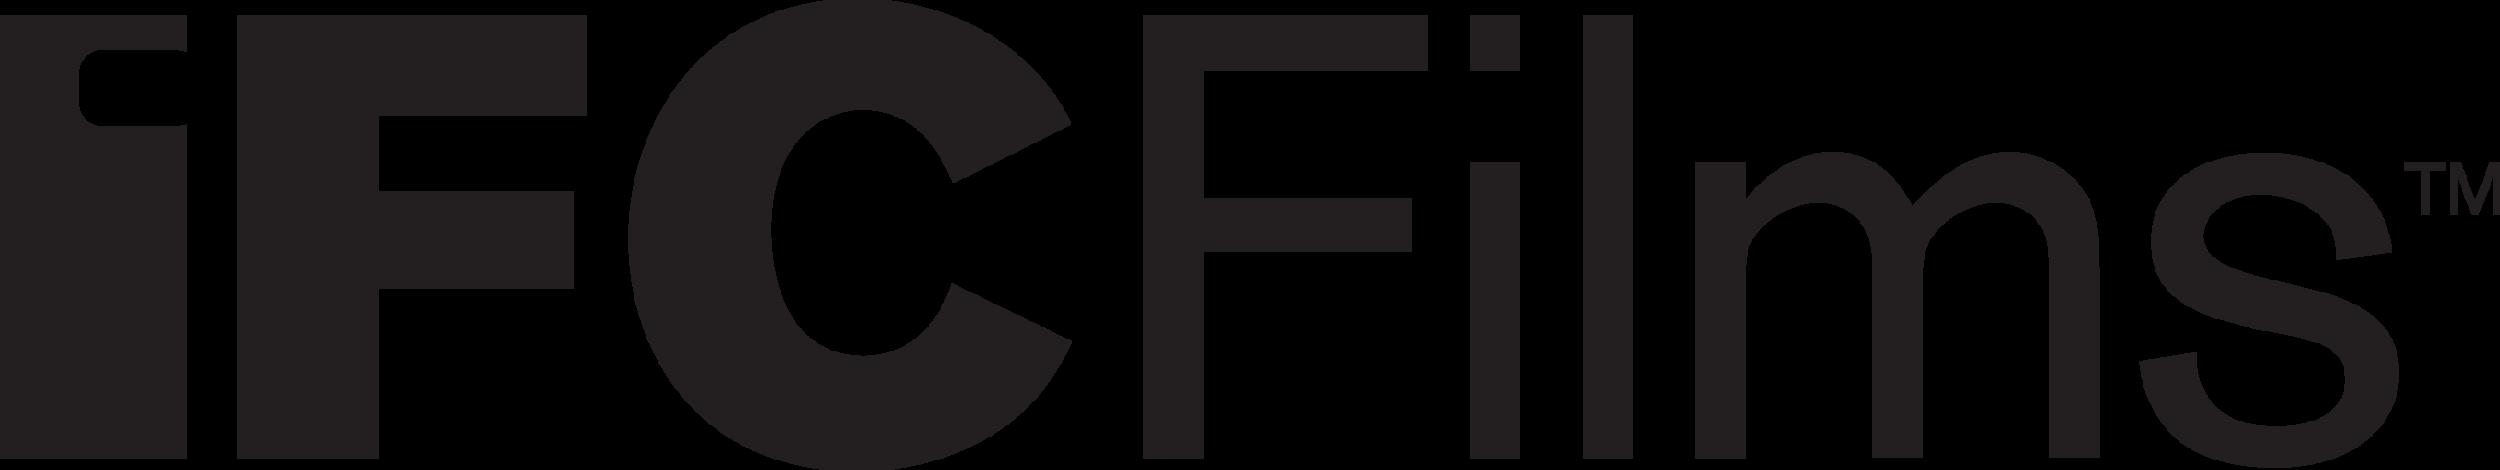 IFC Black.png